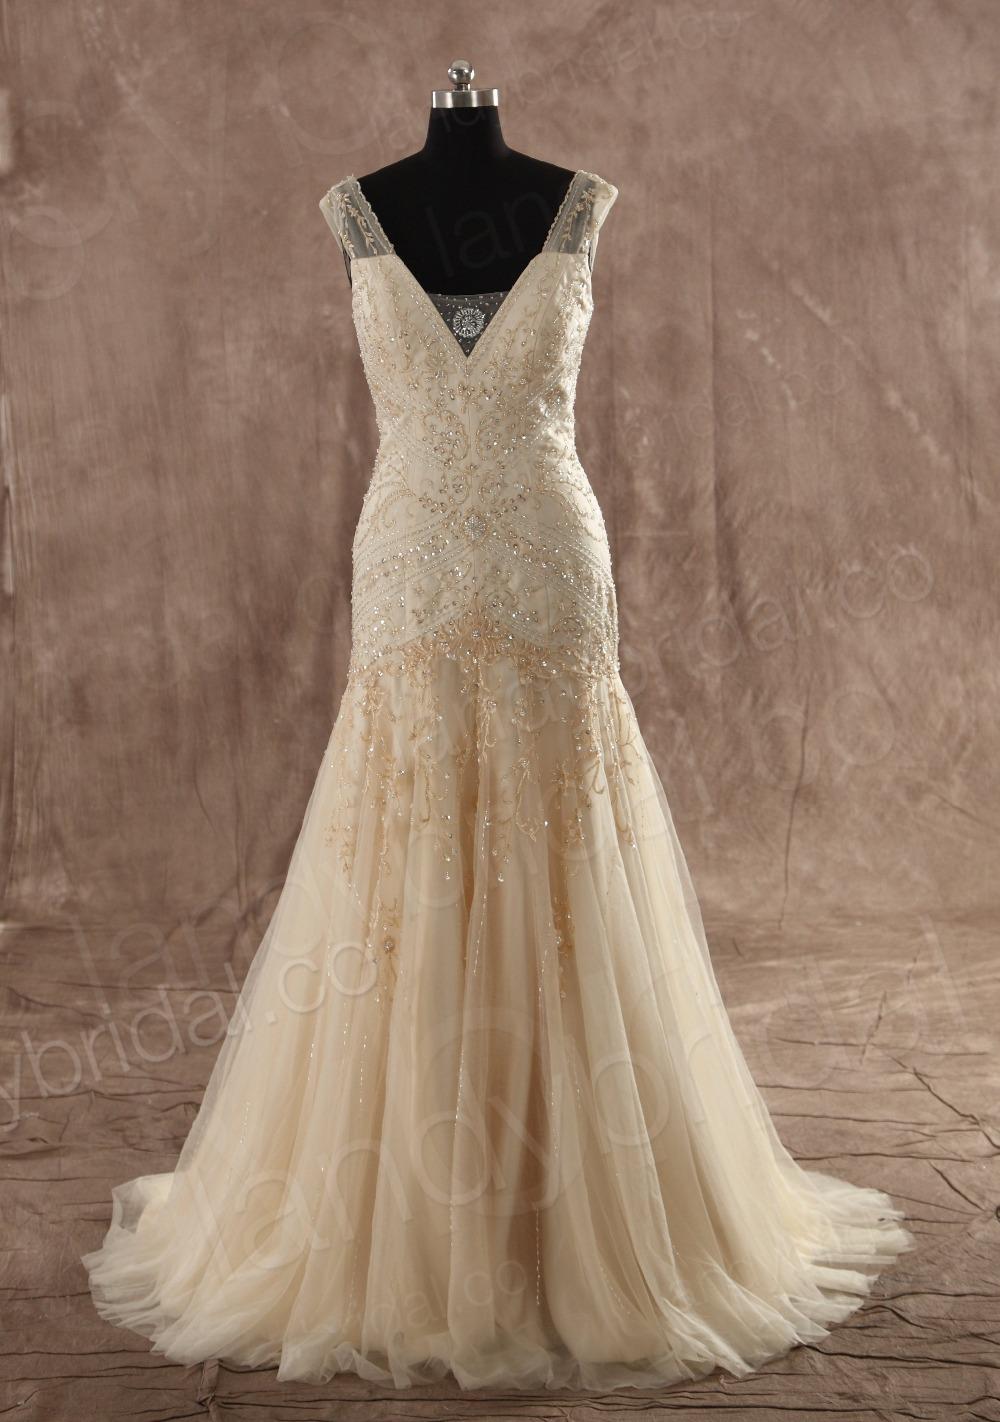 ivory vs white wedding dresses photo - 1